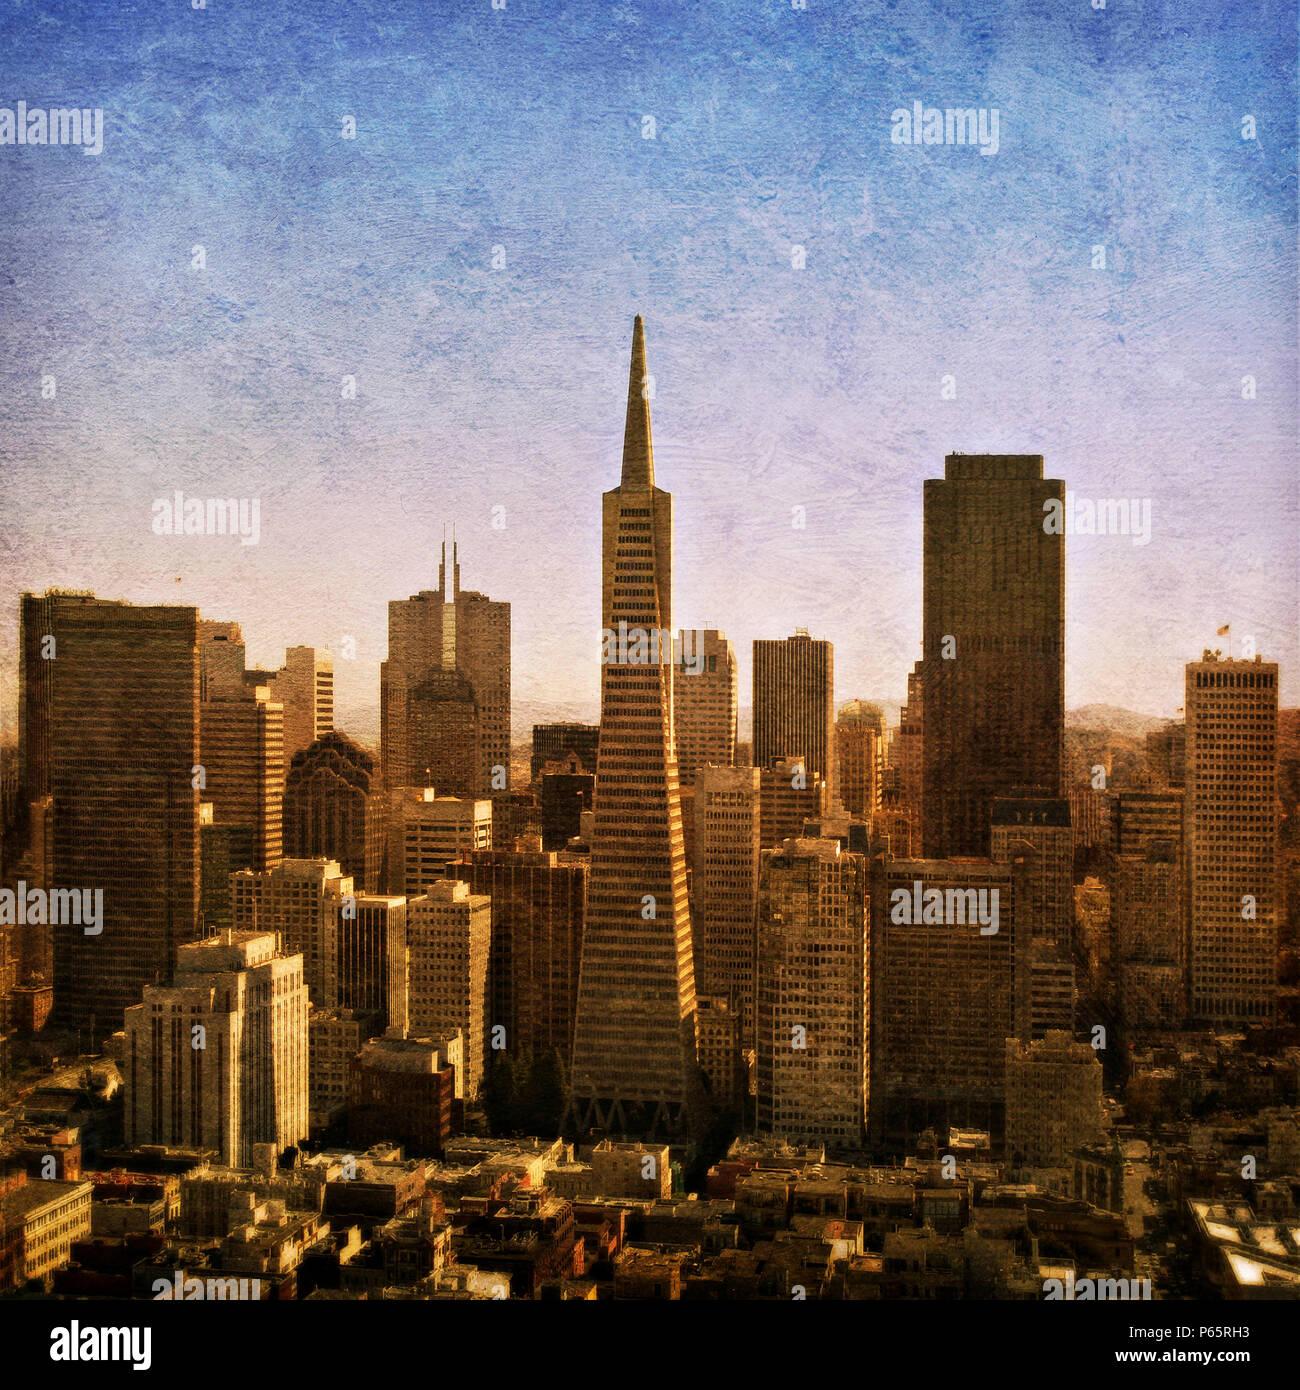 The Transamerica Pyramid in San Francisco, California, USA (painterly) - Stock Image